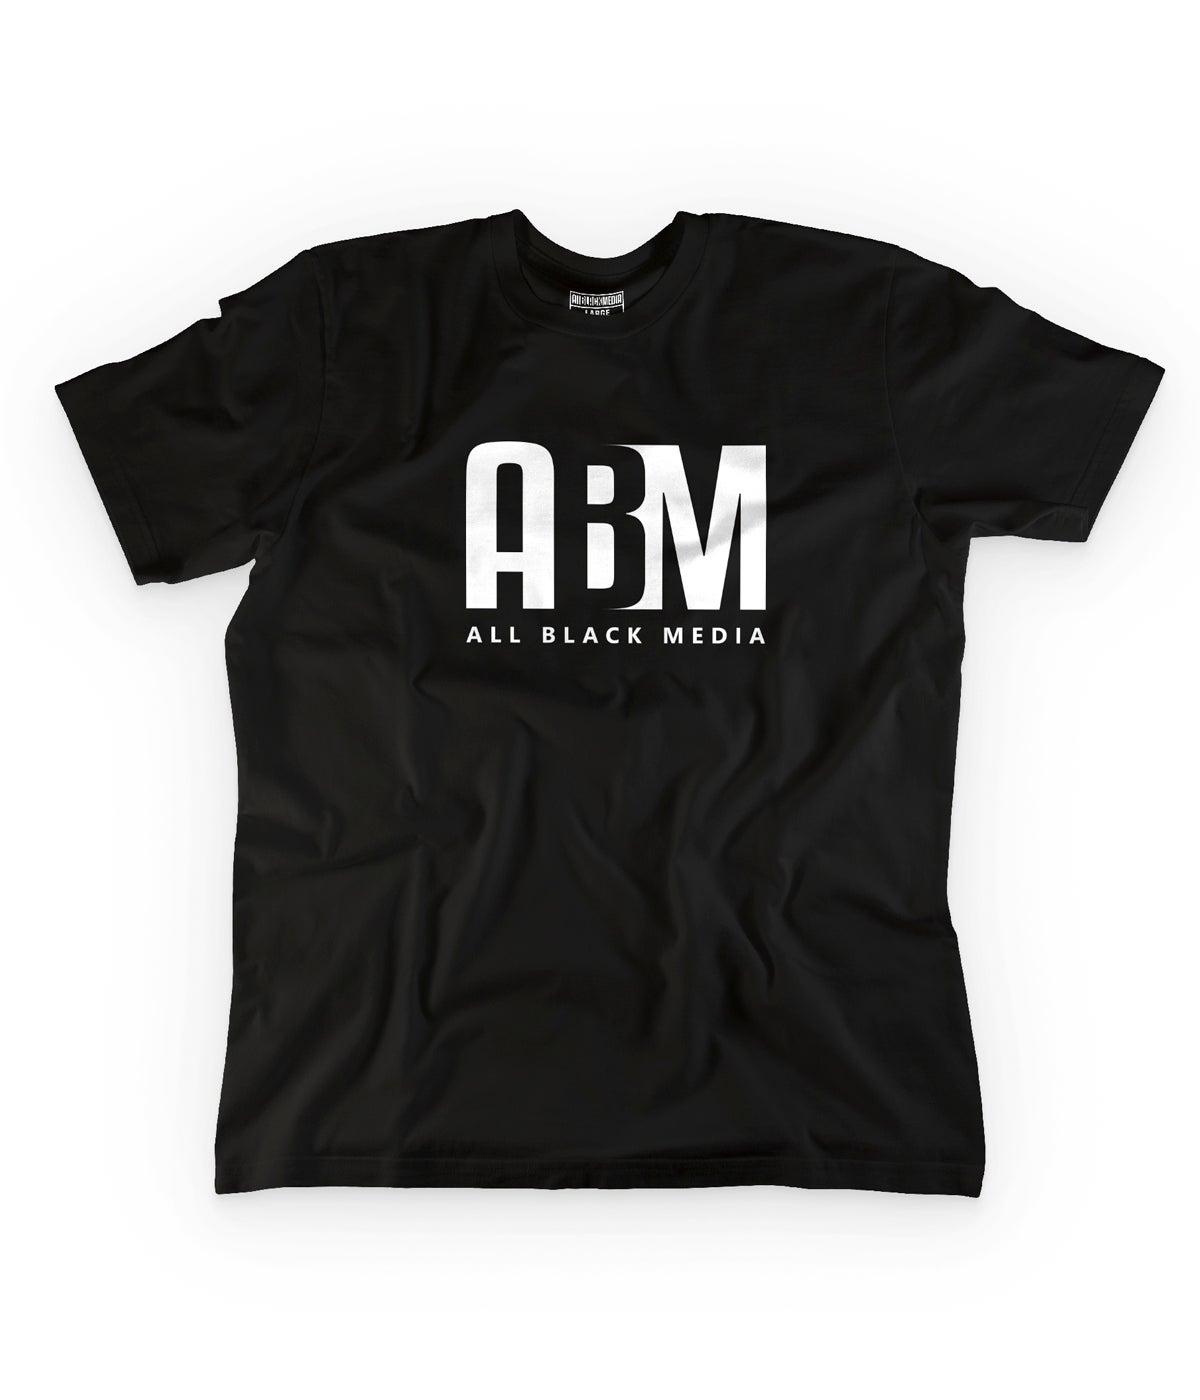 ABM Store - The Official Online Shop for All Black Media — ABM ...